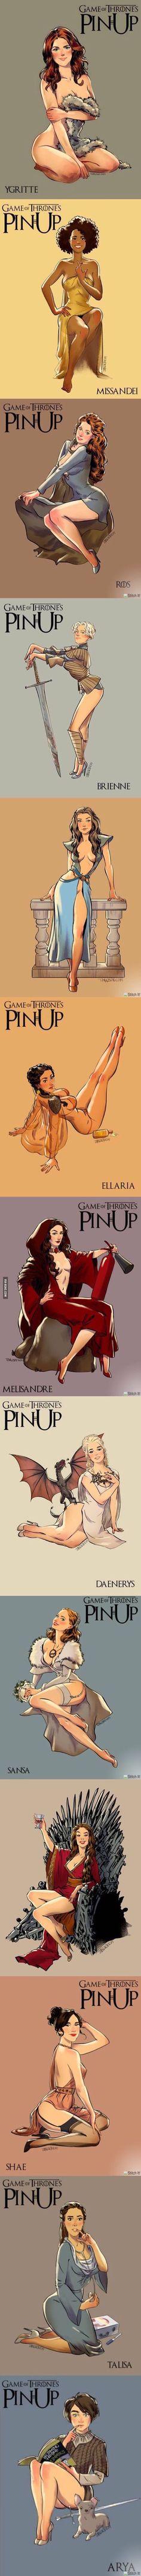 I heard you like Game of Thrones. Enjoy.